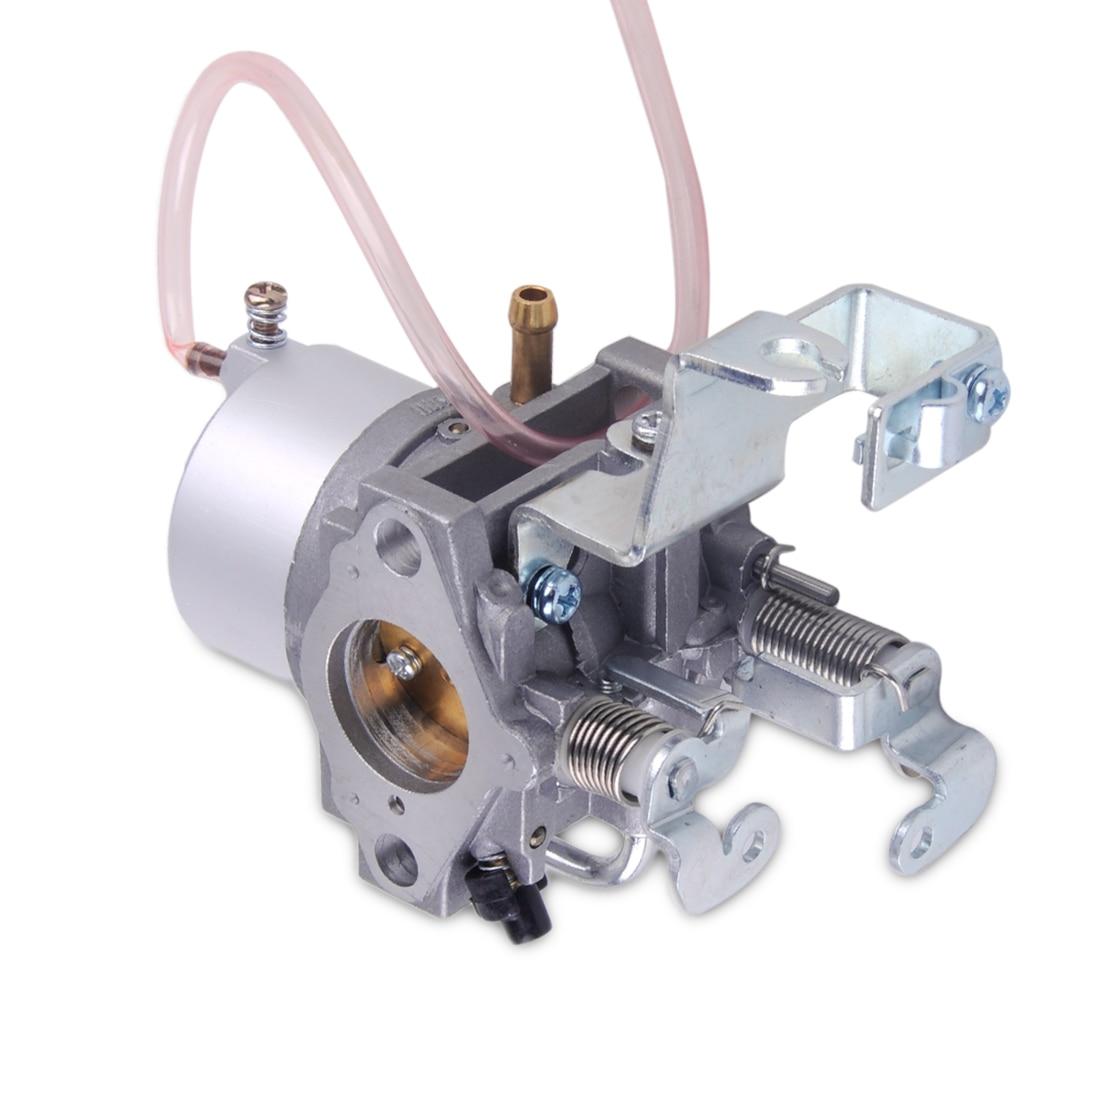 DWCX Metal Carburetor Carb JN6 14101 00 fit for Yamaha Golf Cart G16 G18 G19 G20 G21 4 Cycle Gas Engine 1996 1997 1998 2002